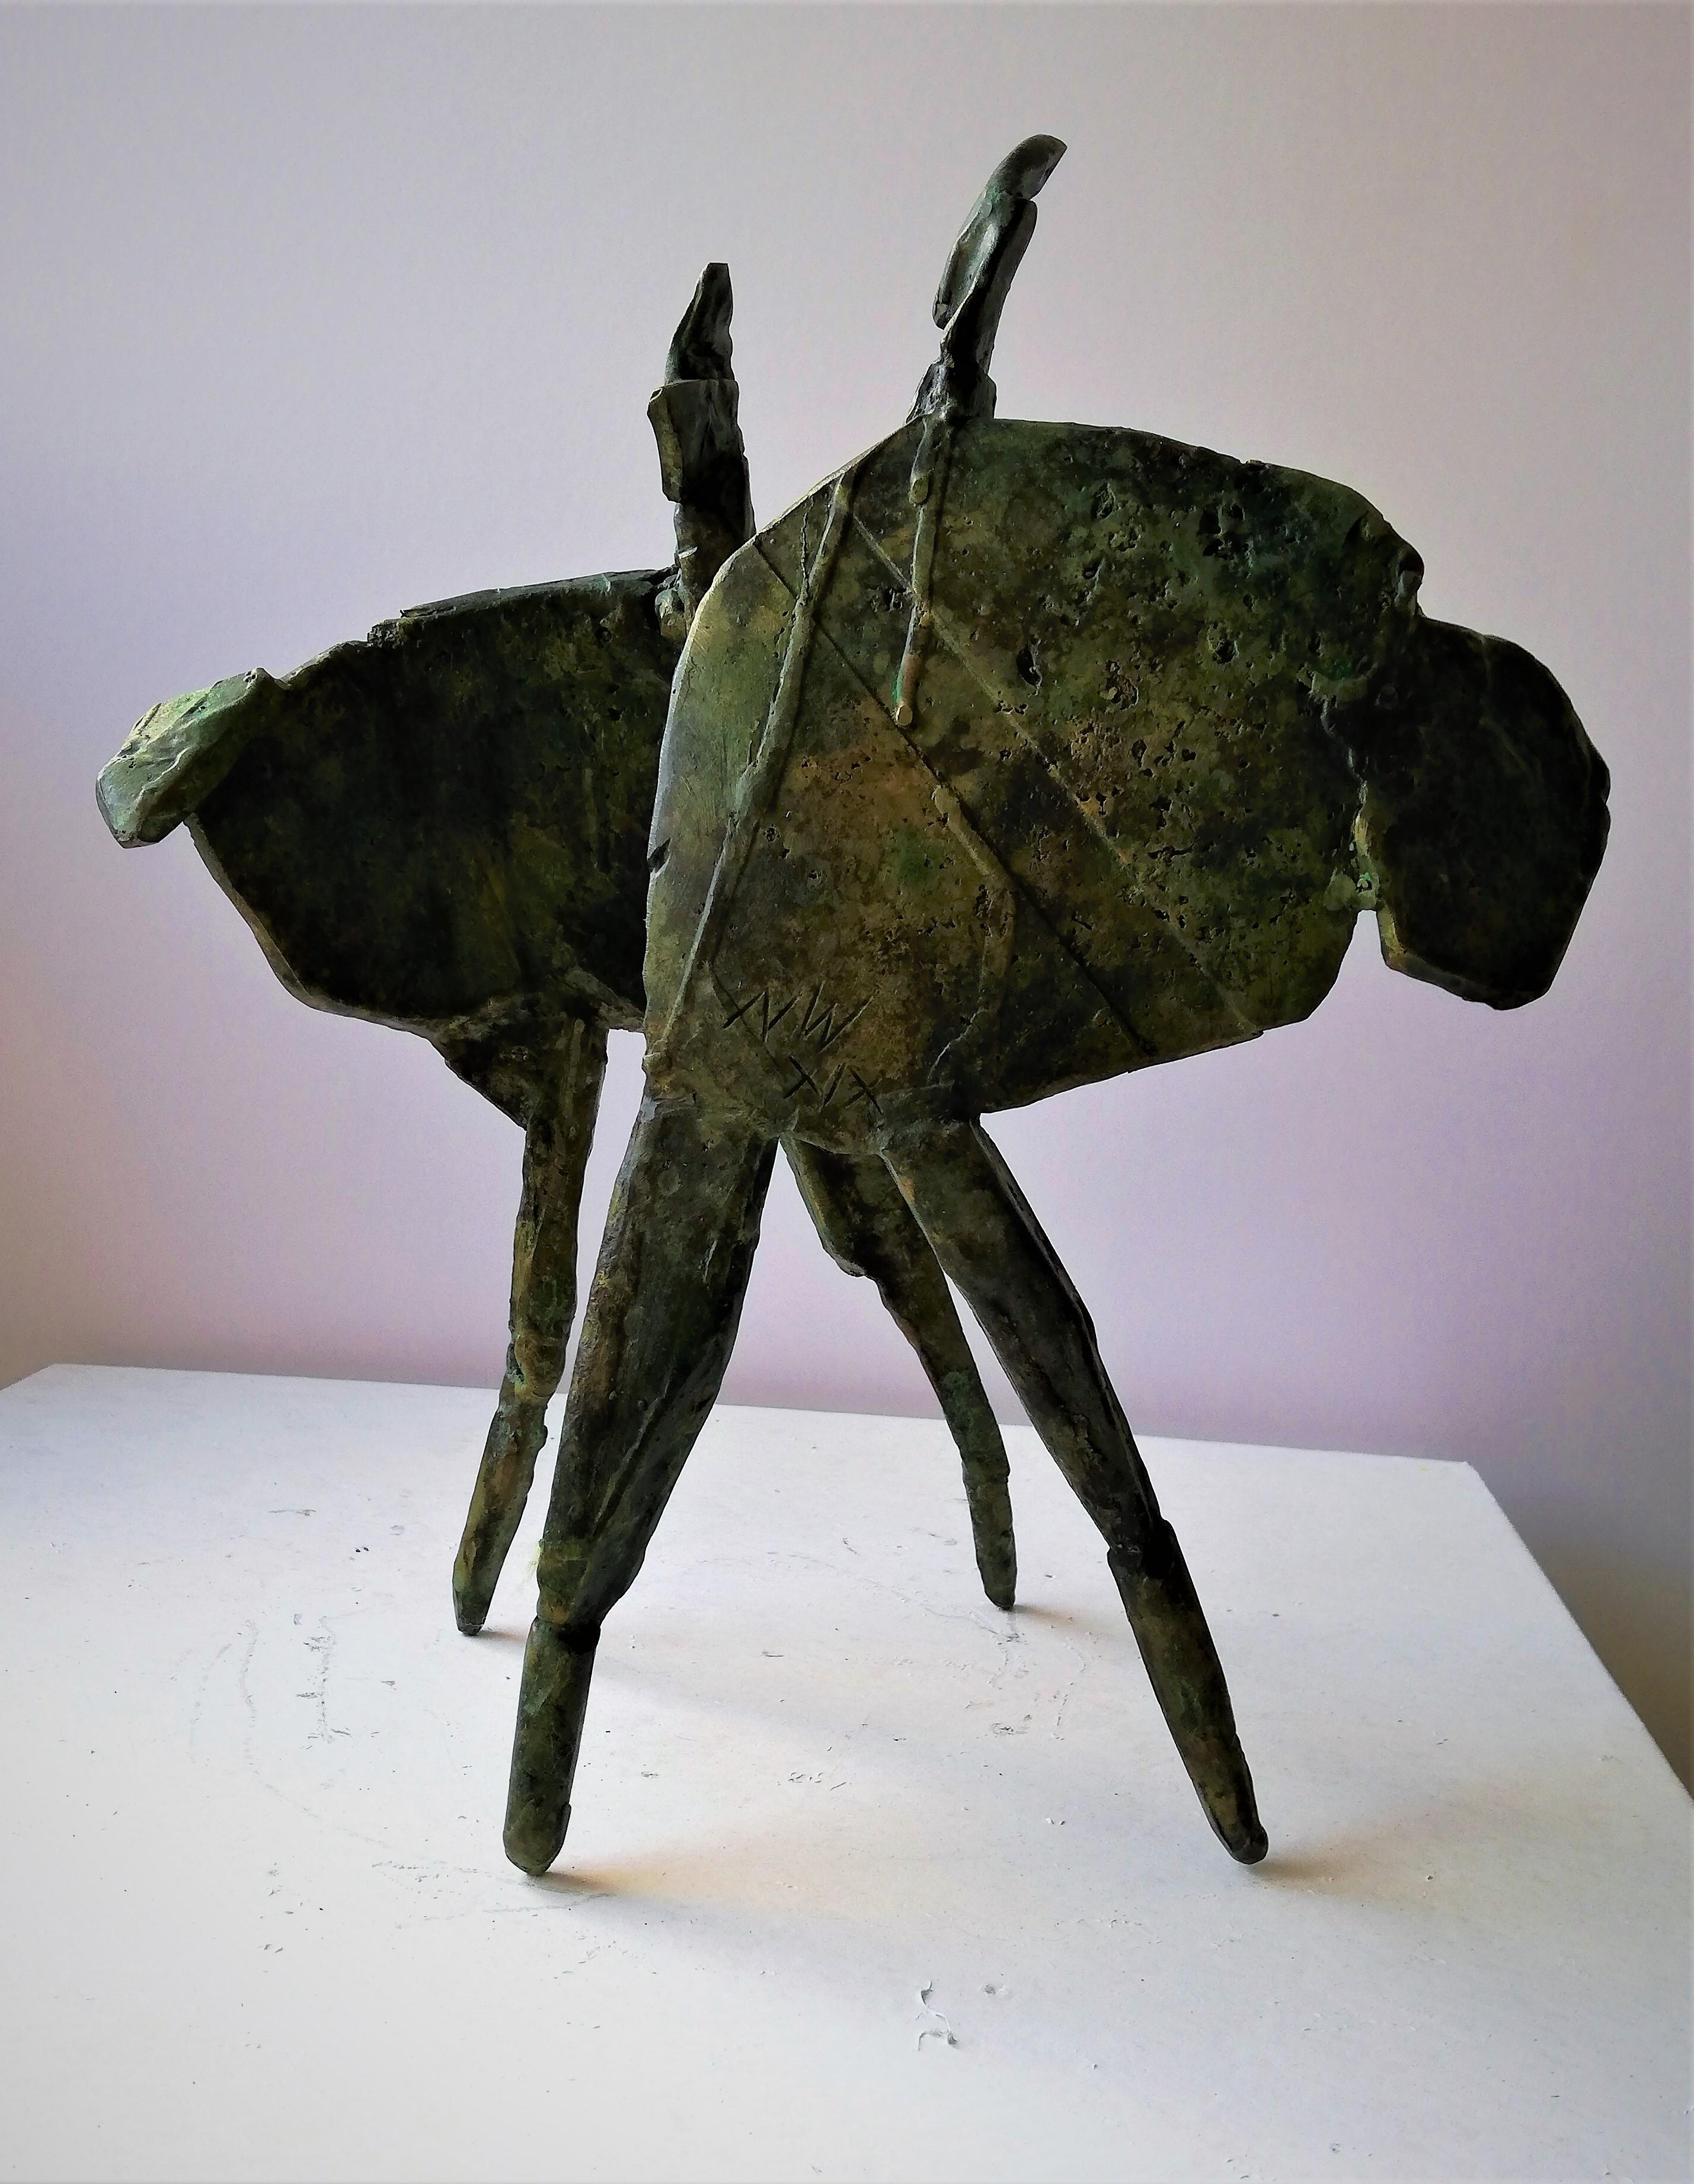 We Danced - Bronze, Contemporary, Figurative Sculpture by Neil Wood